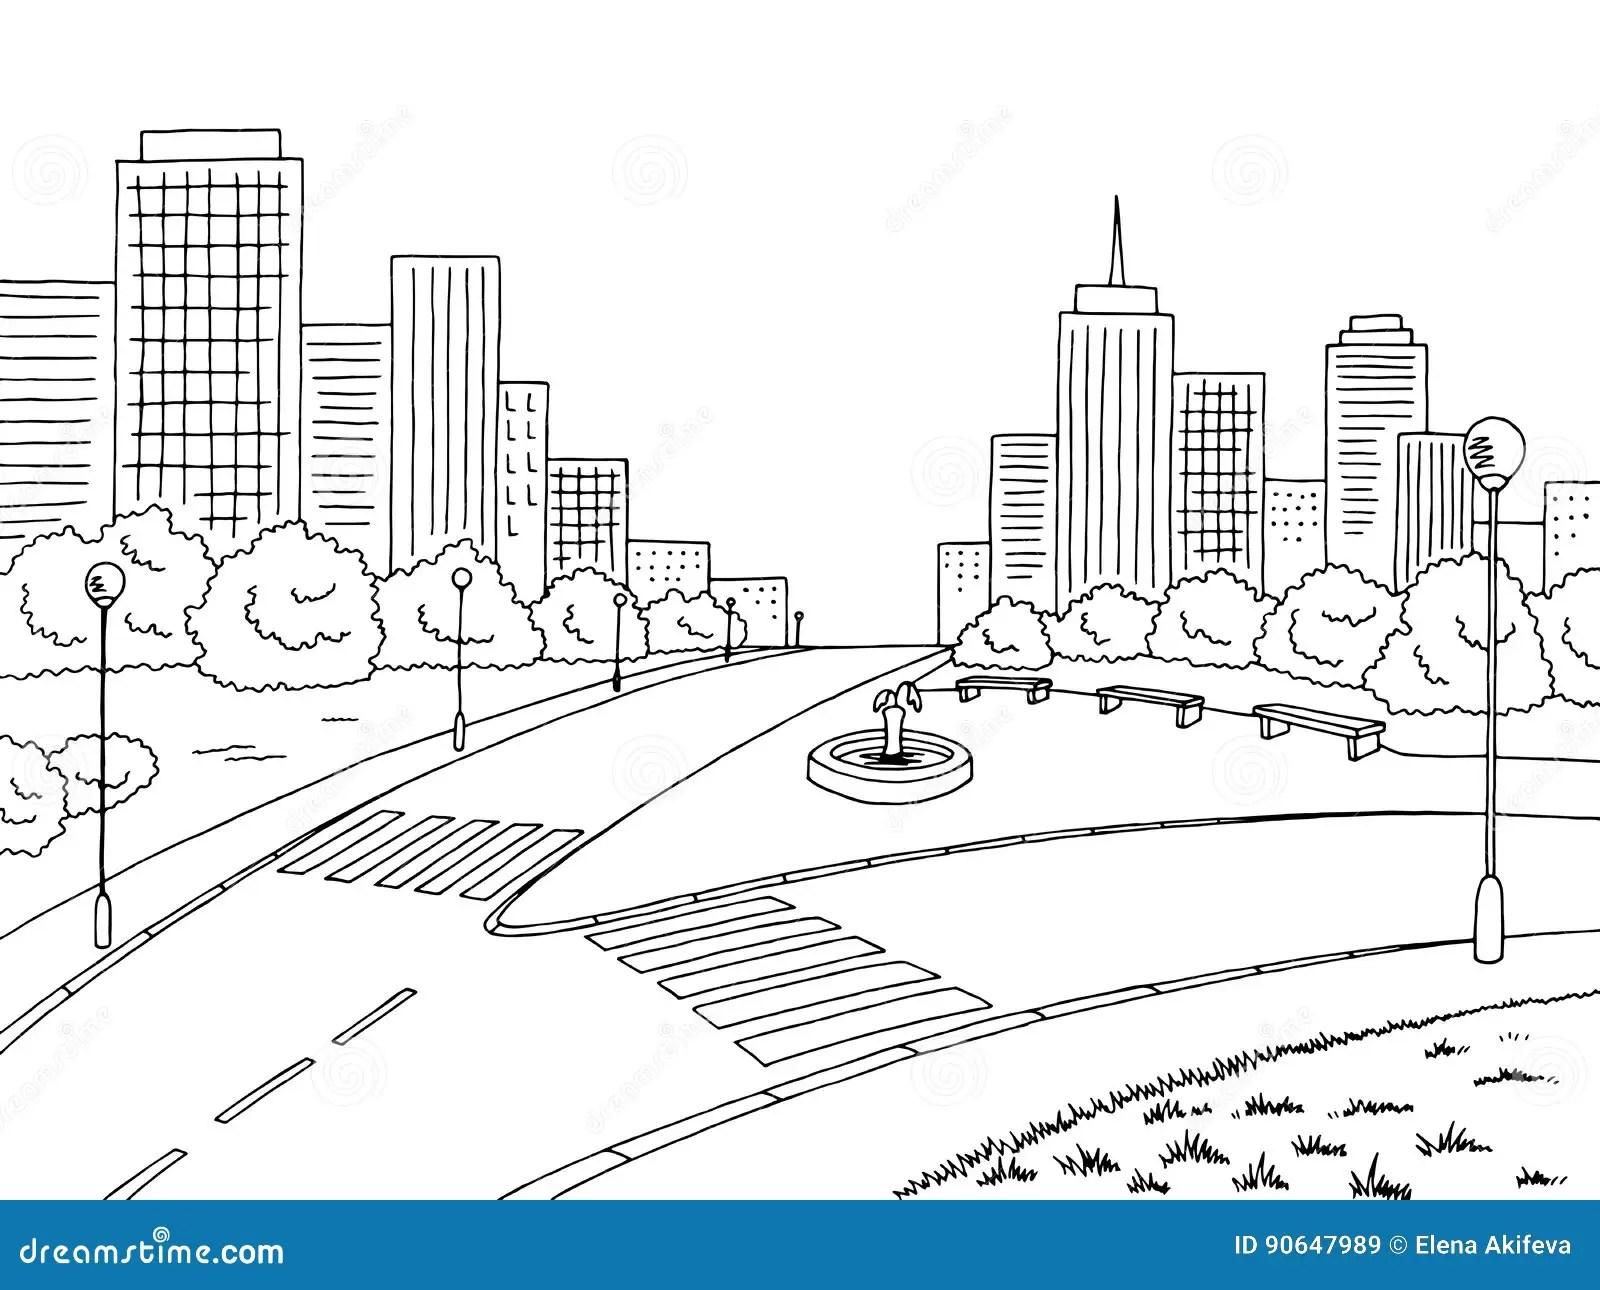 hight resolution of tree house graphic art black white landscape illustration